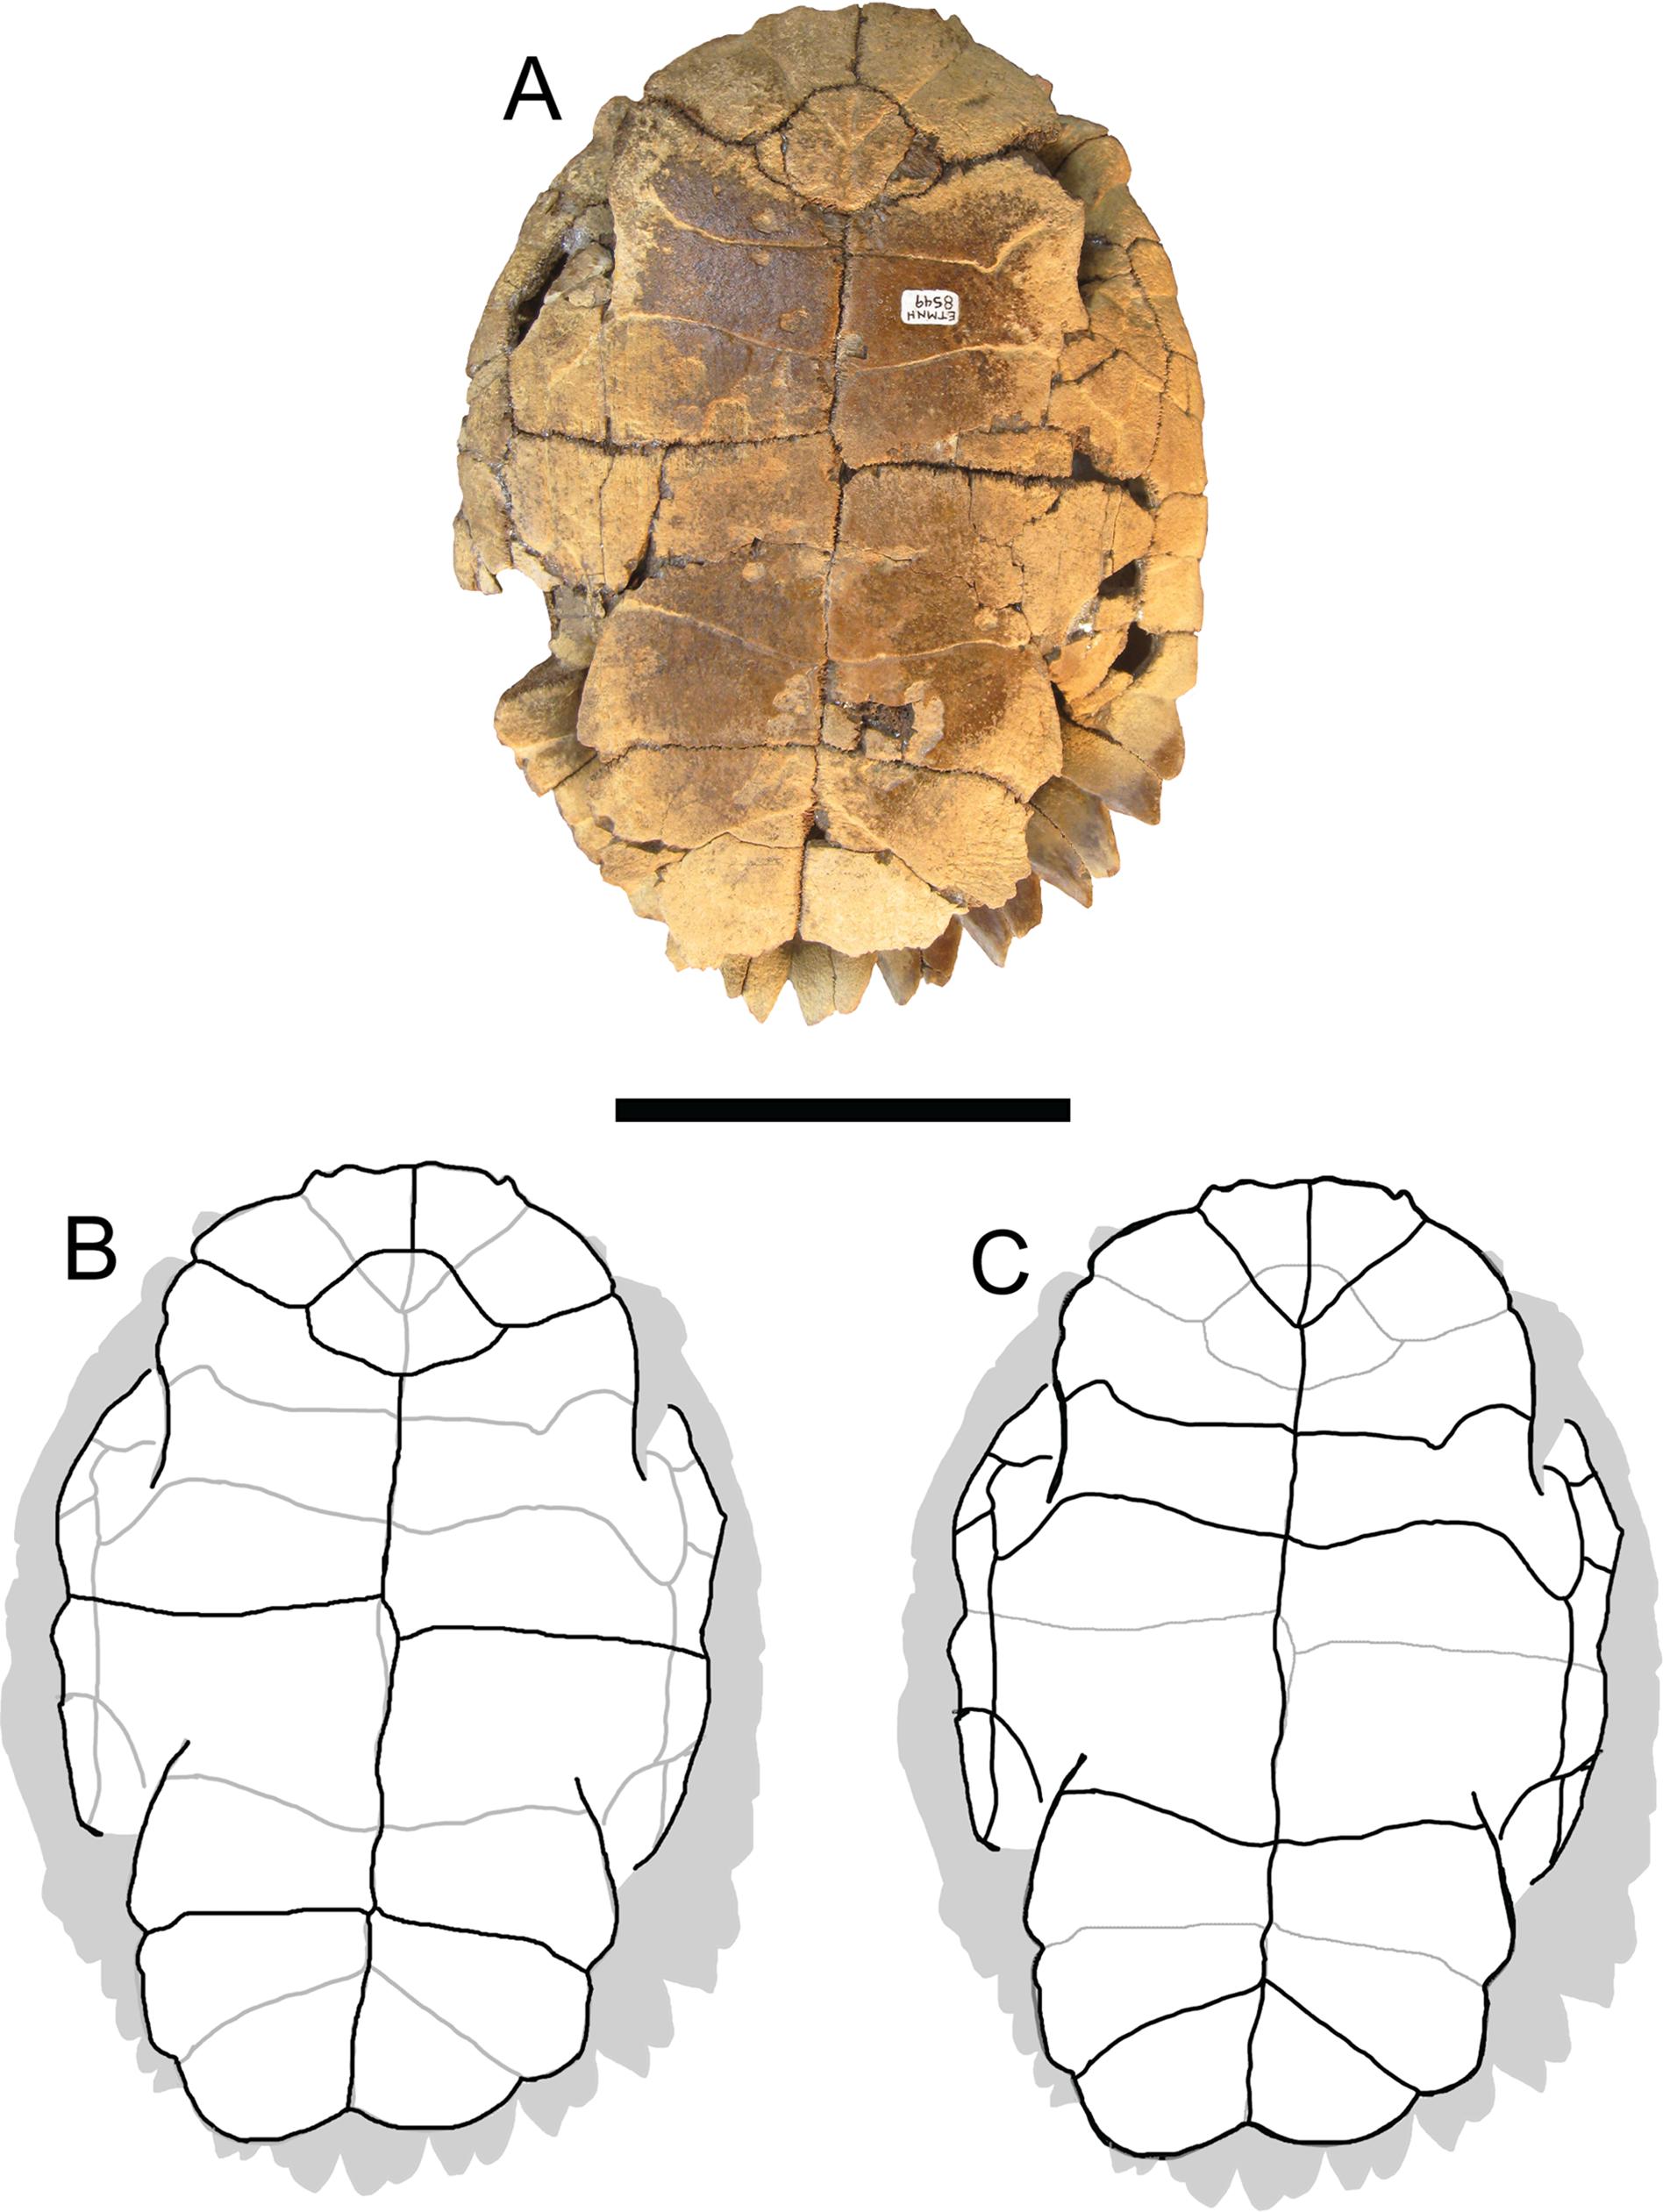 A new slider turtle (Testudines: Emydidae: Deirochelyinae